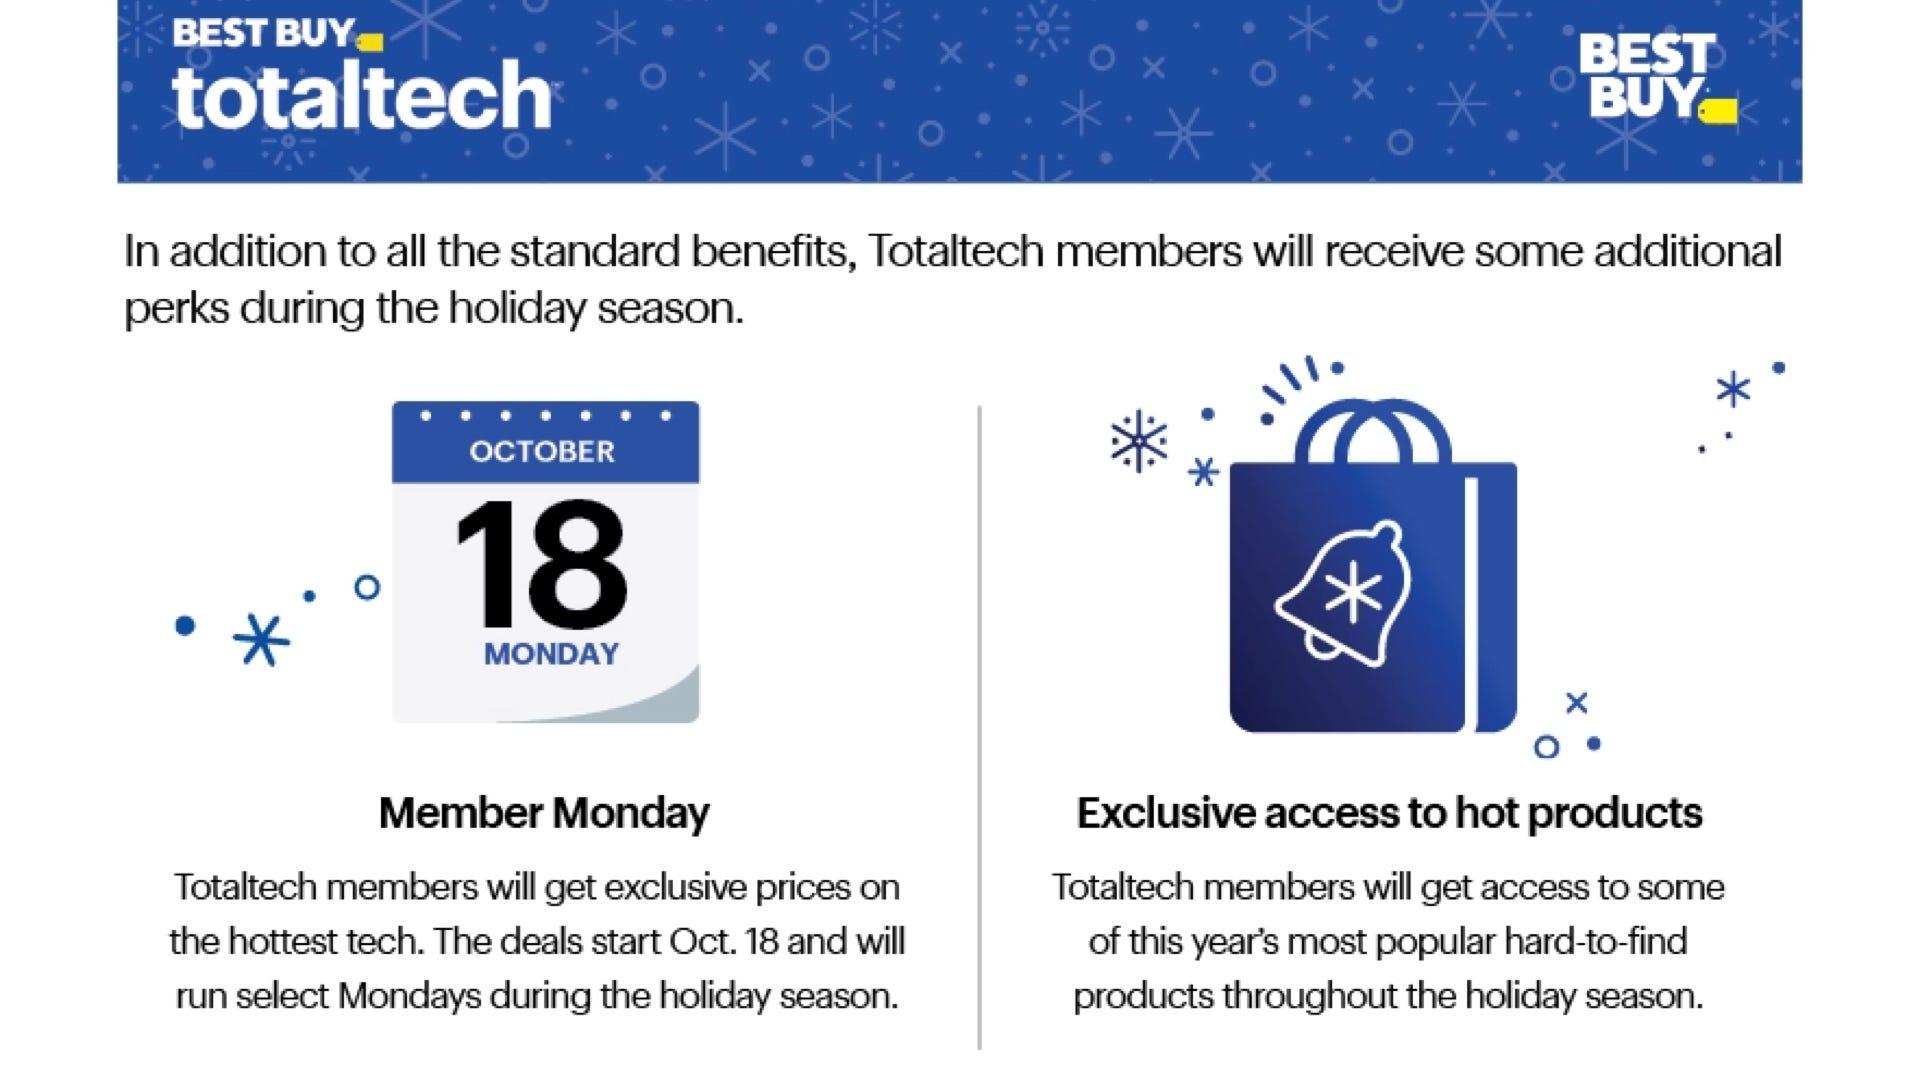 Best Buy Totaltech membership